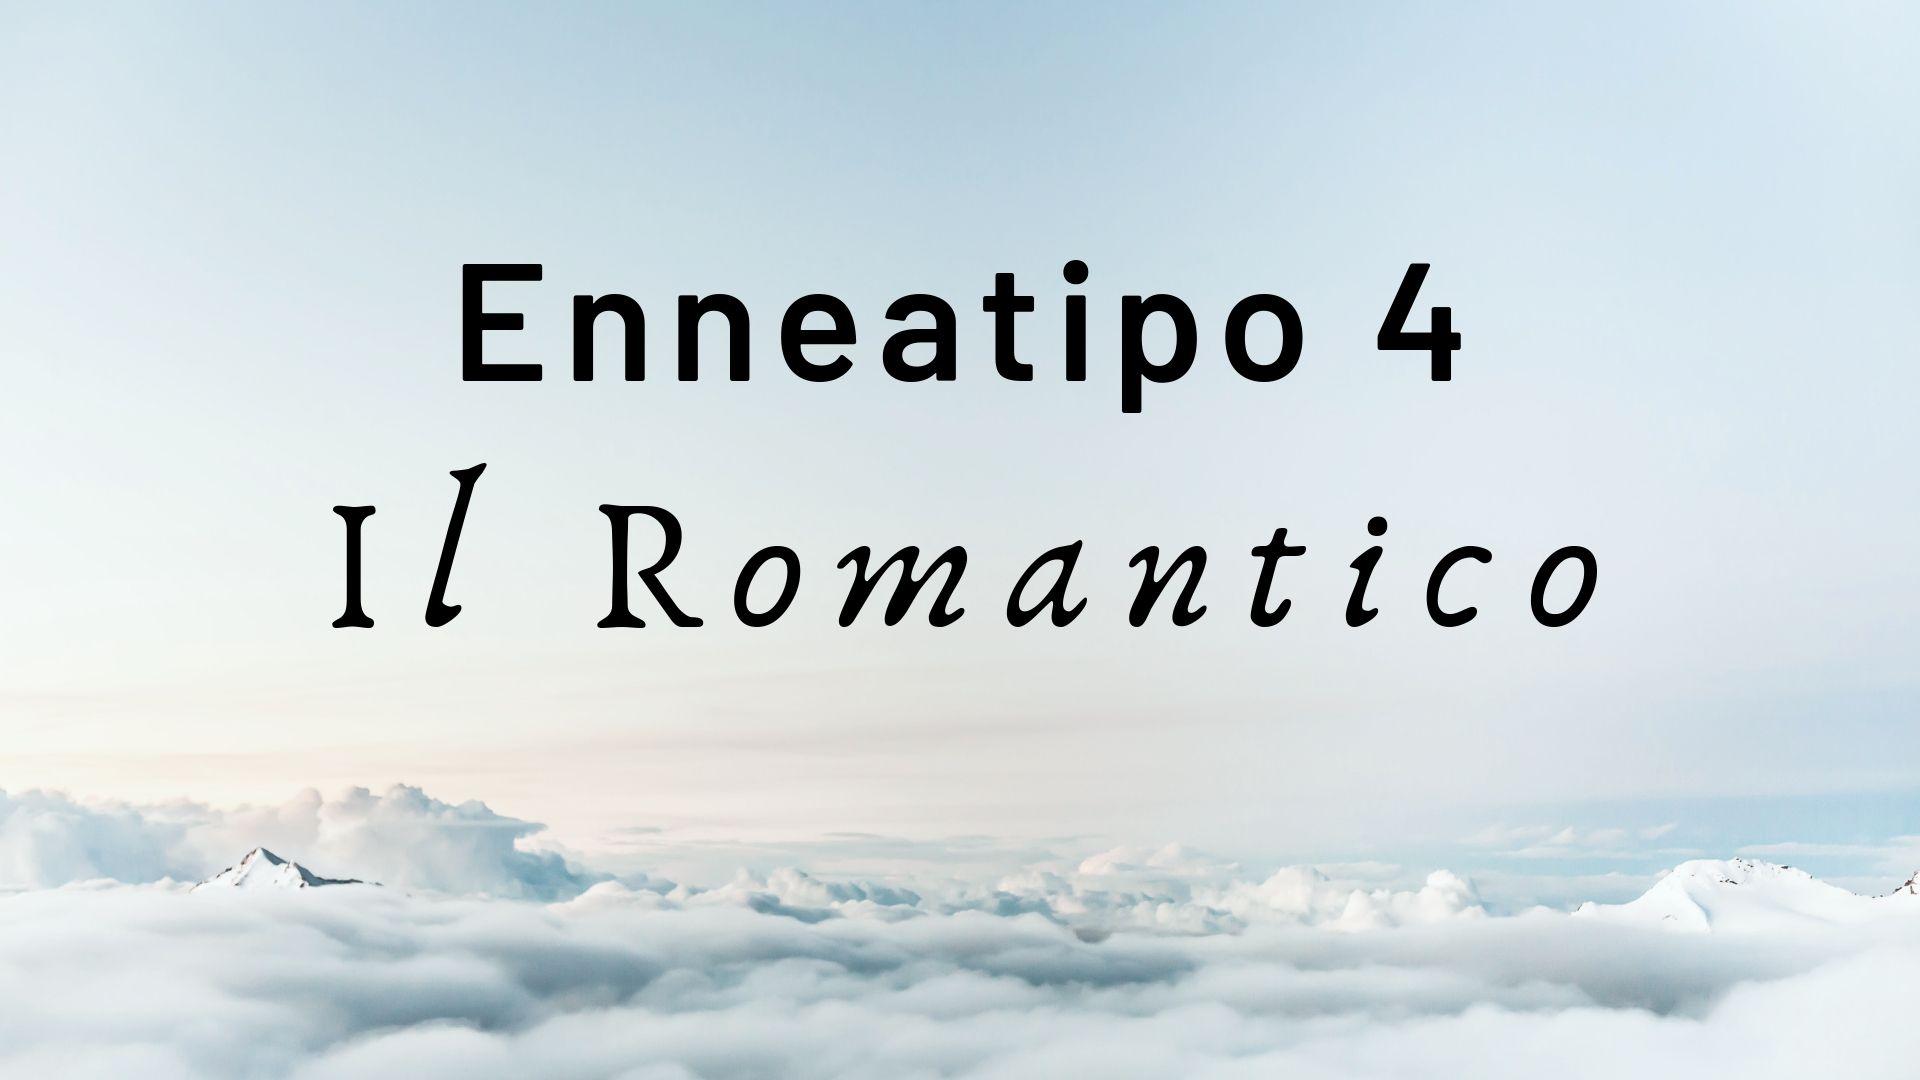 Enneatipo 4